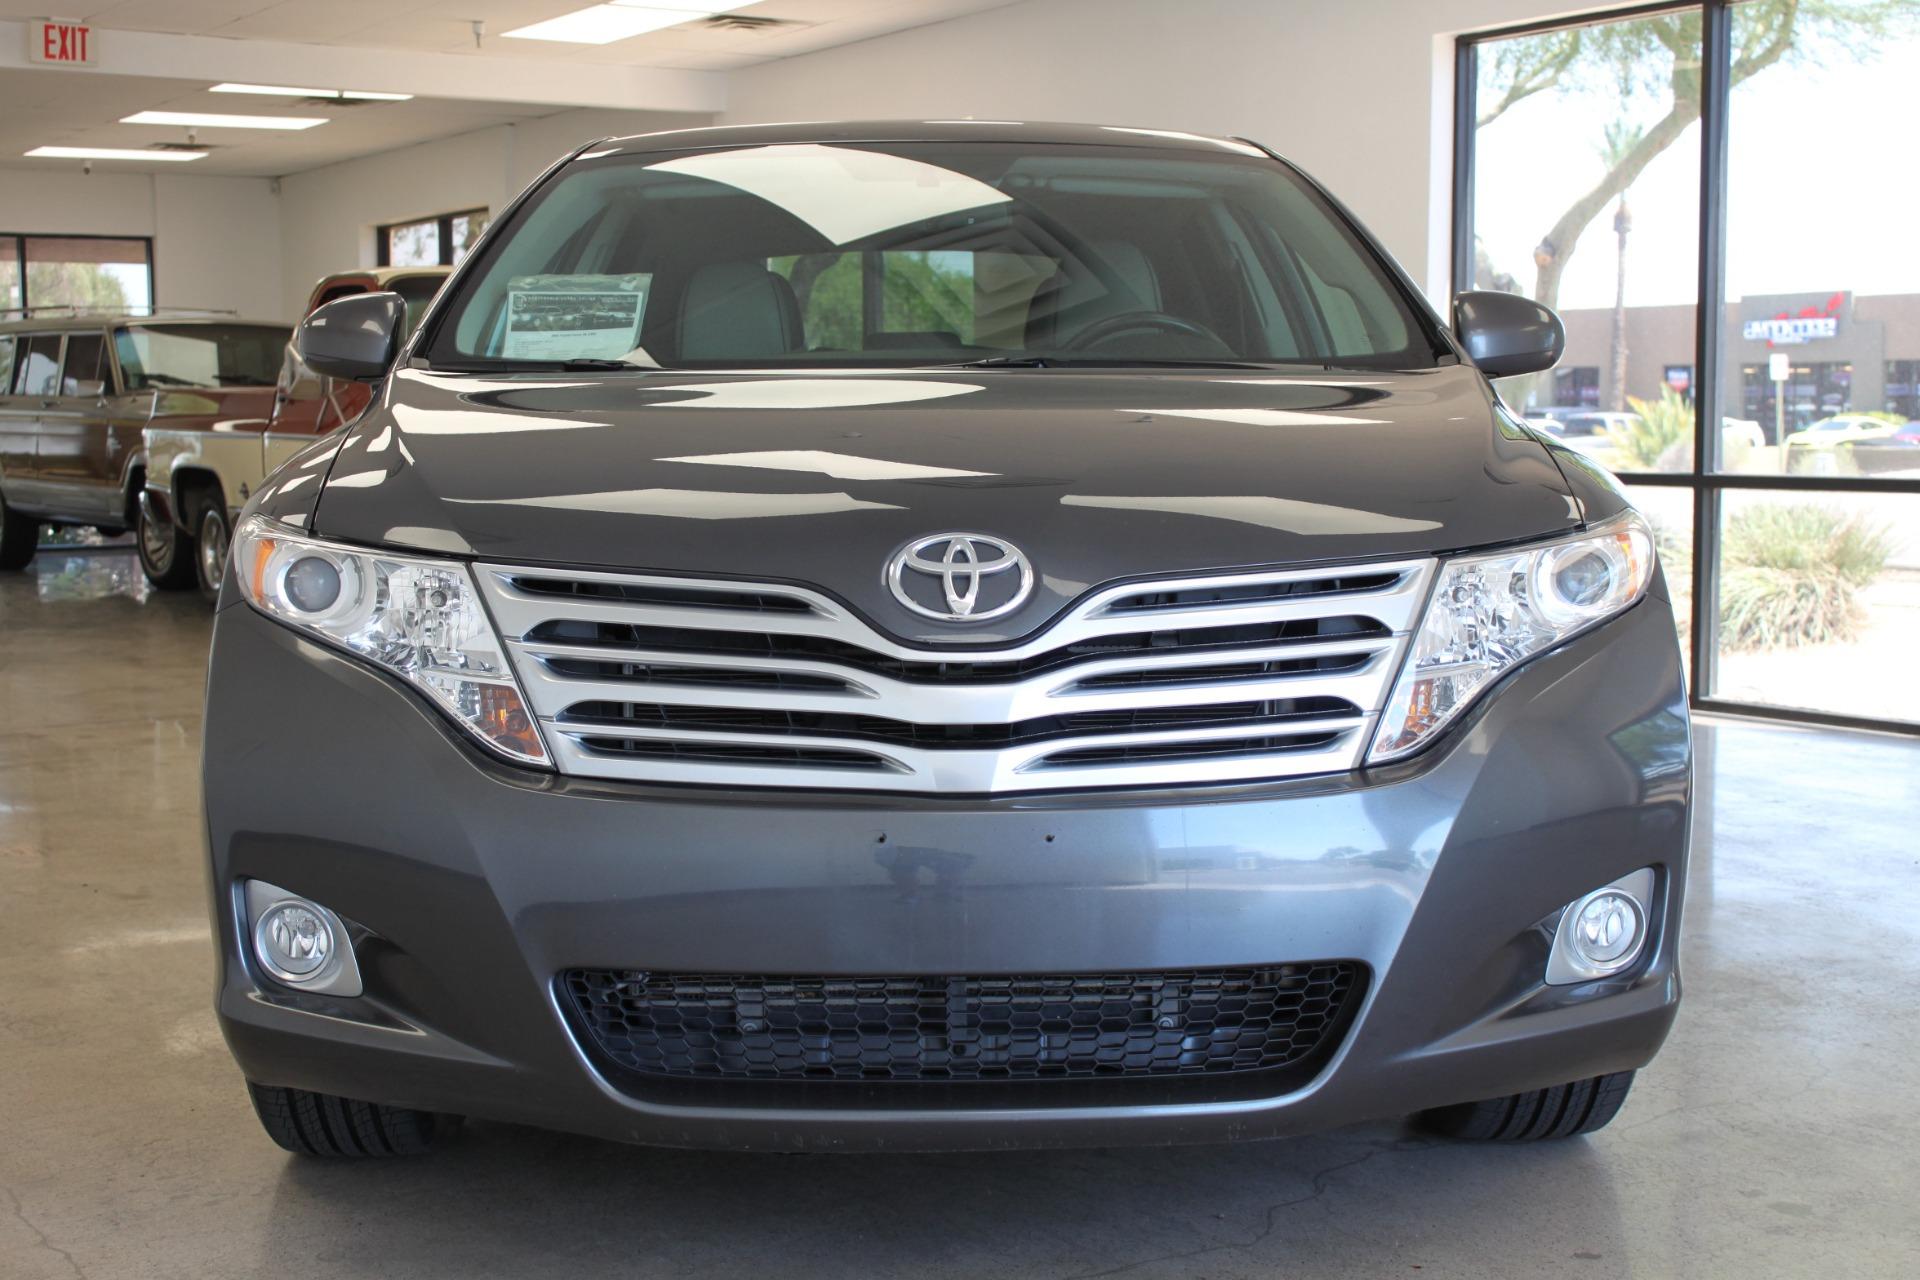 Used-2009-Toyota-Venza-SE-AWD-Grand-Cherokee